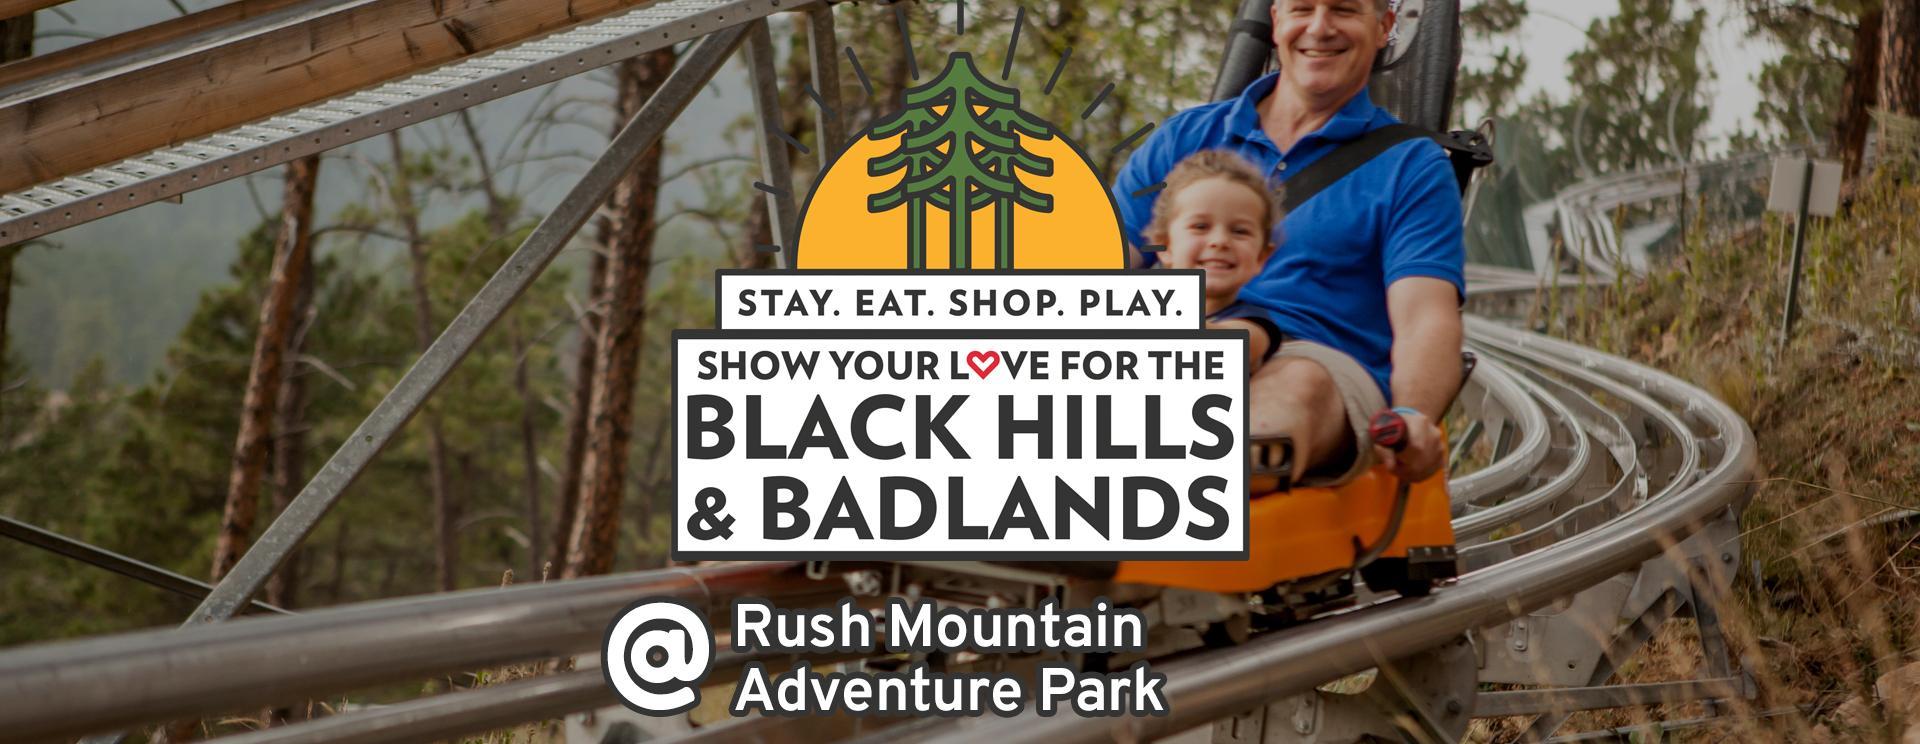 Rush Mountain Adventure Park | 2020 Safety Measures